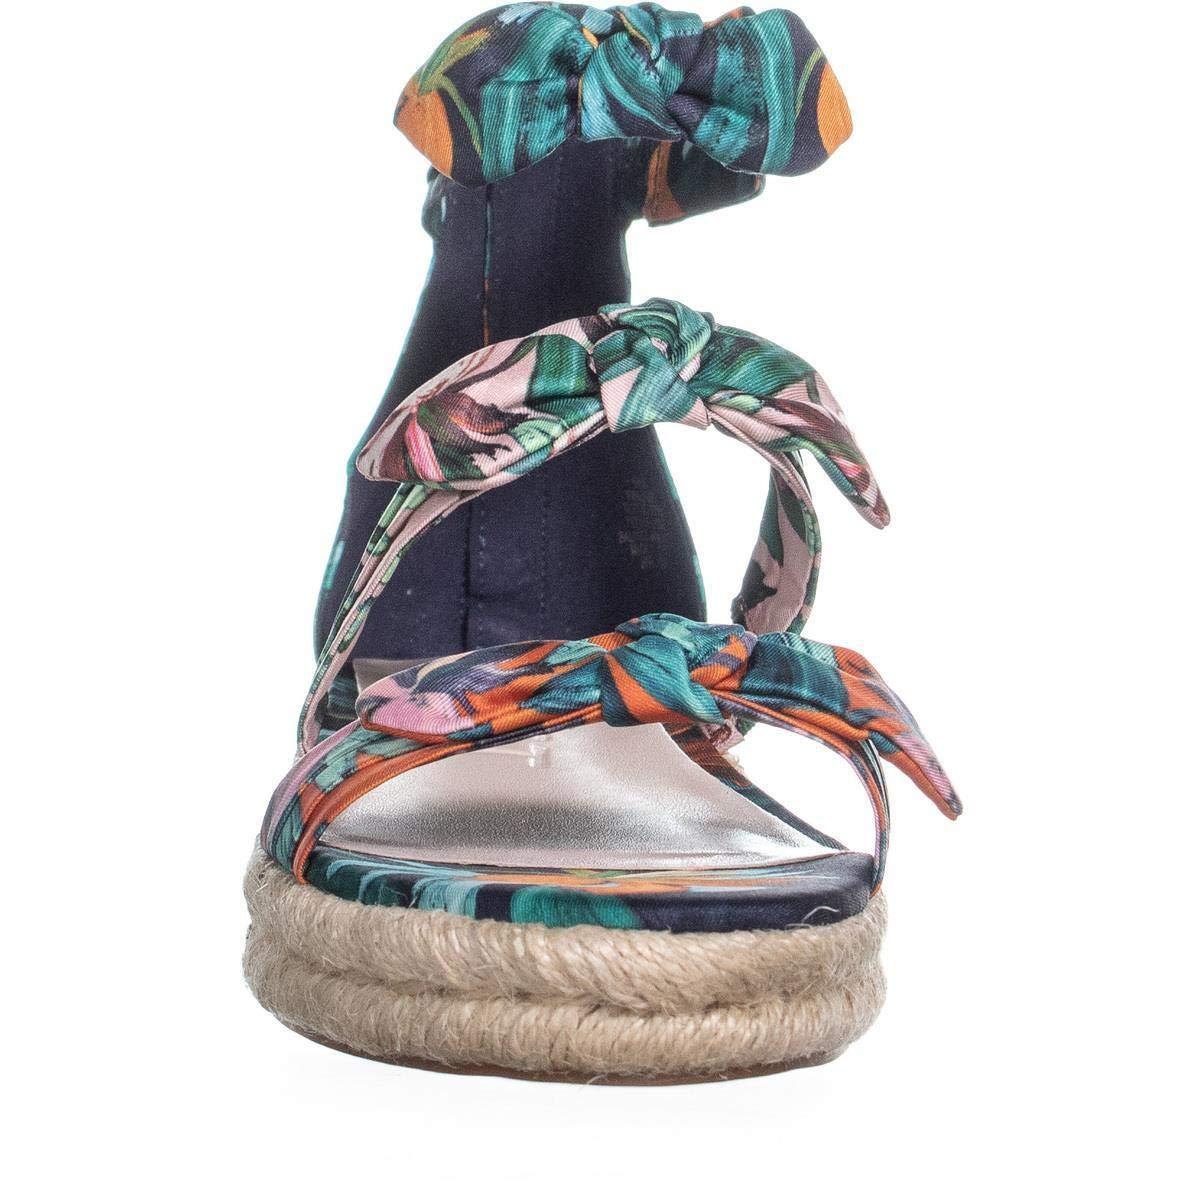 75571208e94 Details about Nine West Womens Allegro Open Toe Casual Espadrille Sandals,  Blue, Size 7.0 OSIz